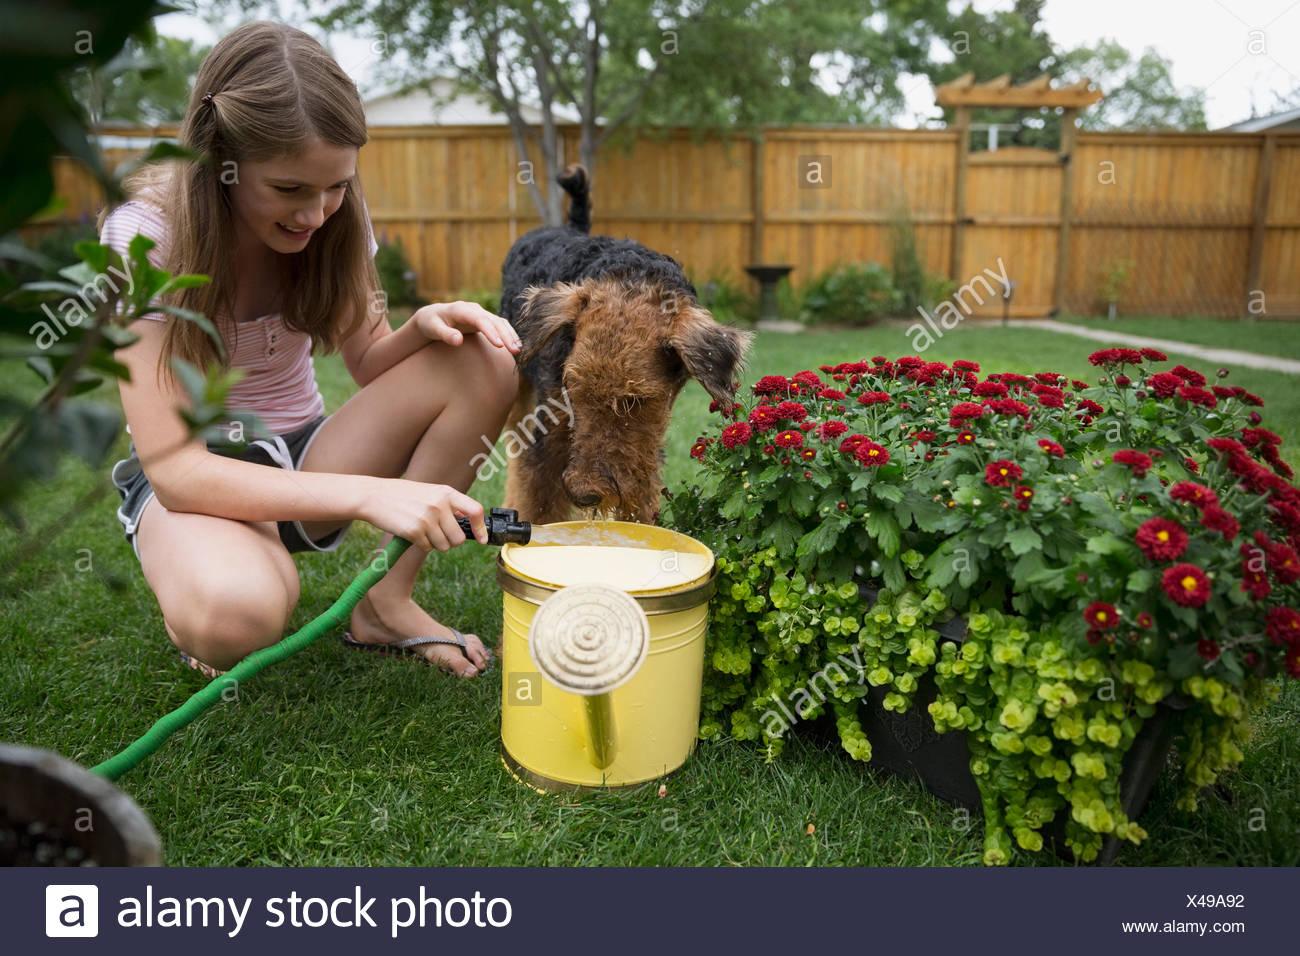 Dog watching girl filling watering can in backyard - Stock Image